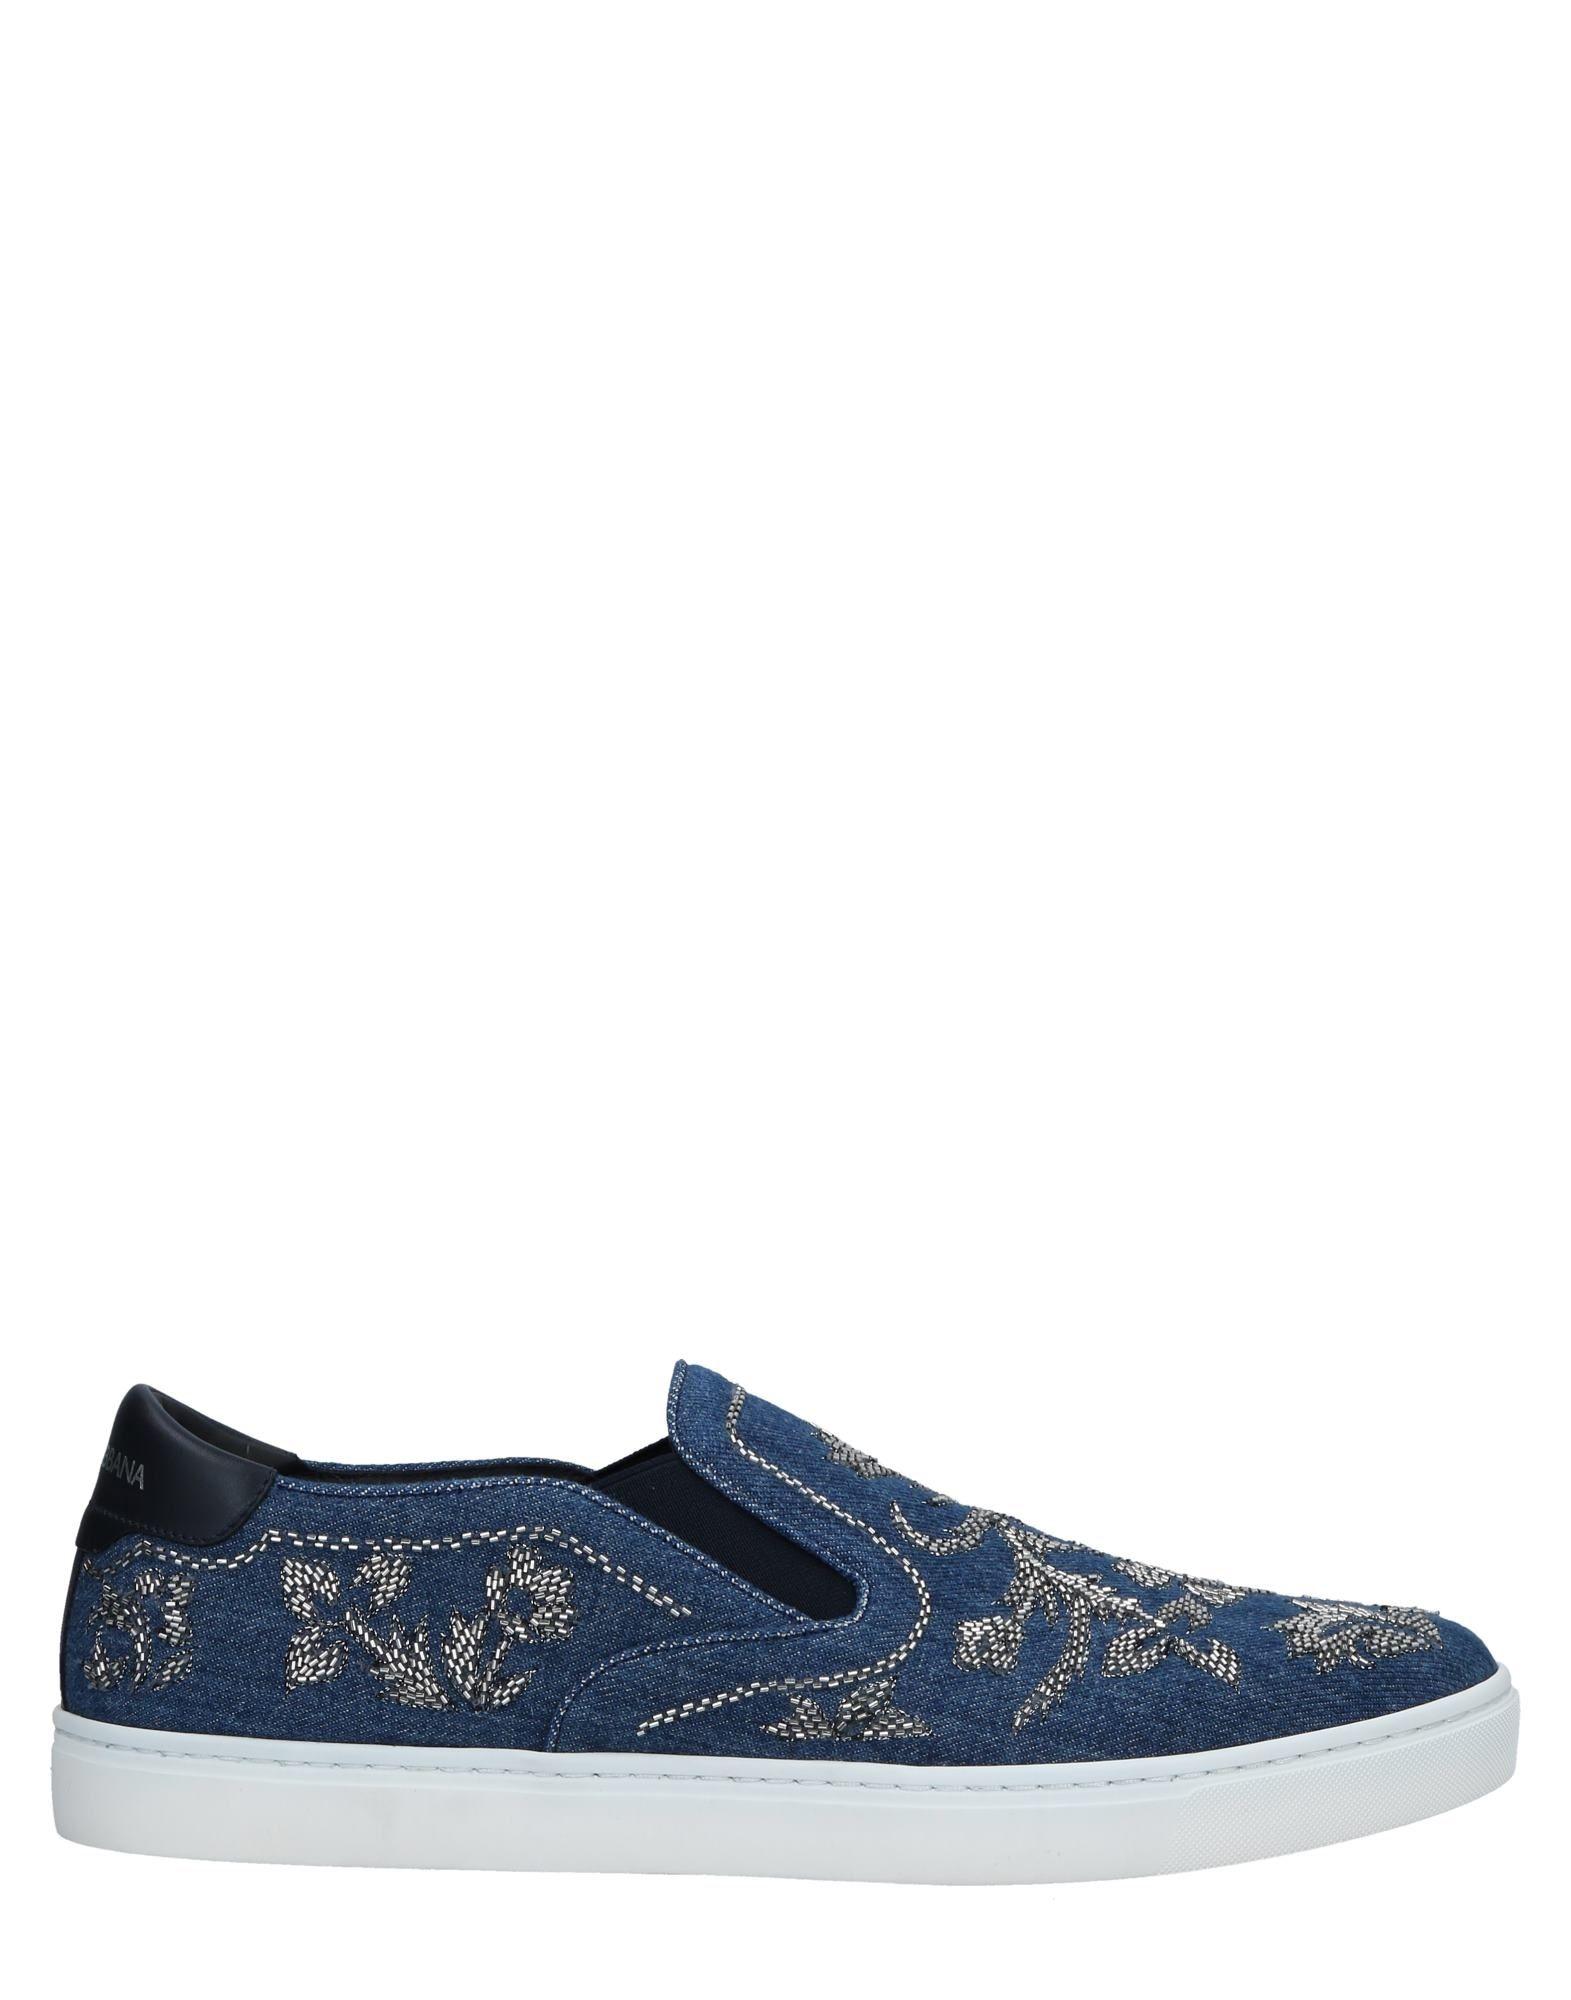 Dolce & Gabbana 11520023LD Sneakers Herren  11520023LD Gabbana c7d108